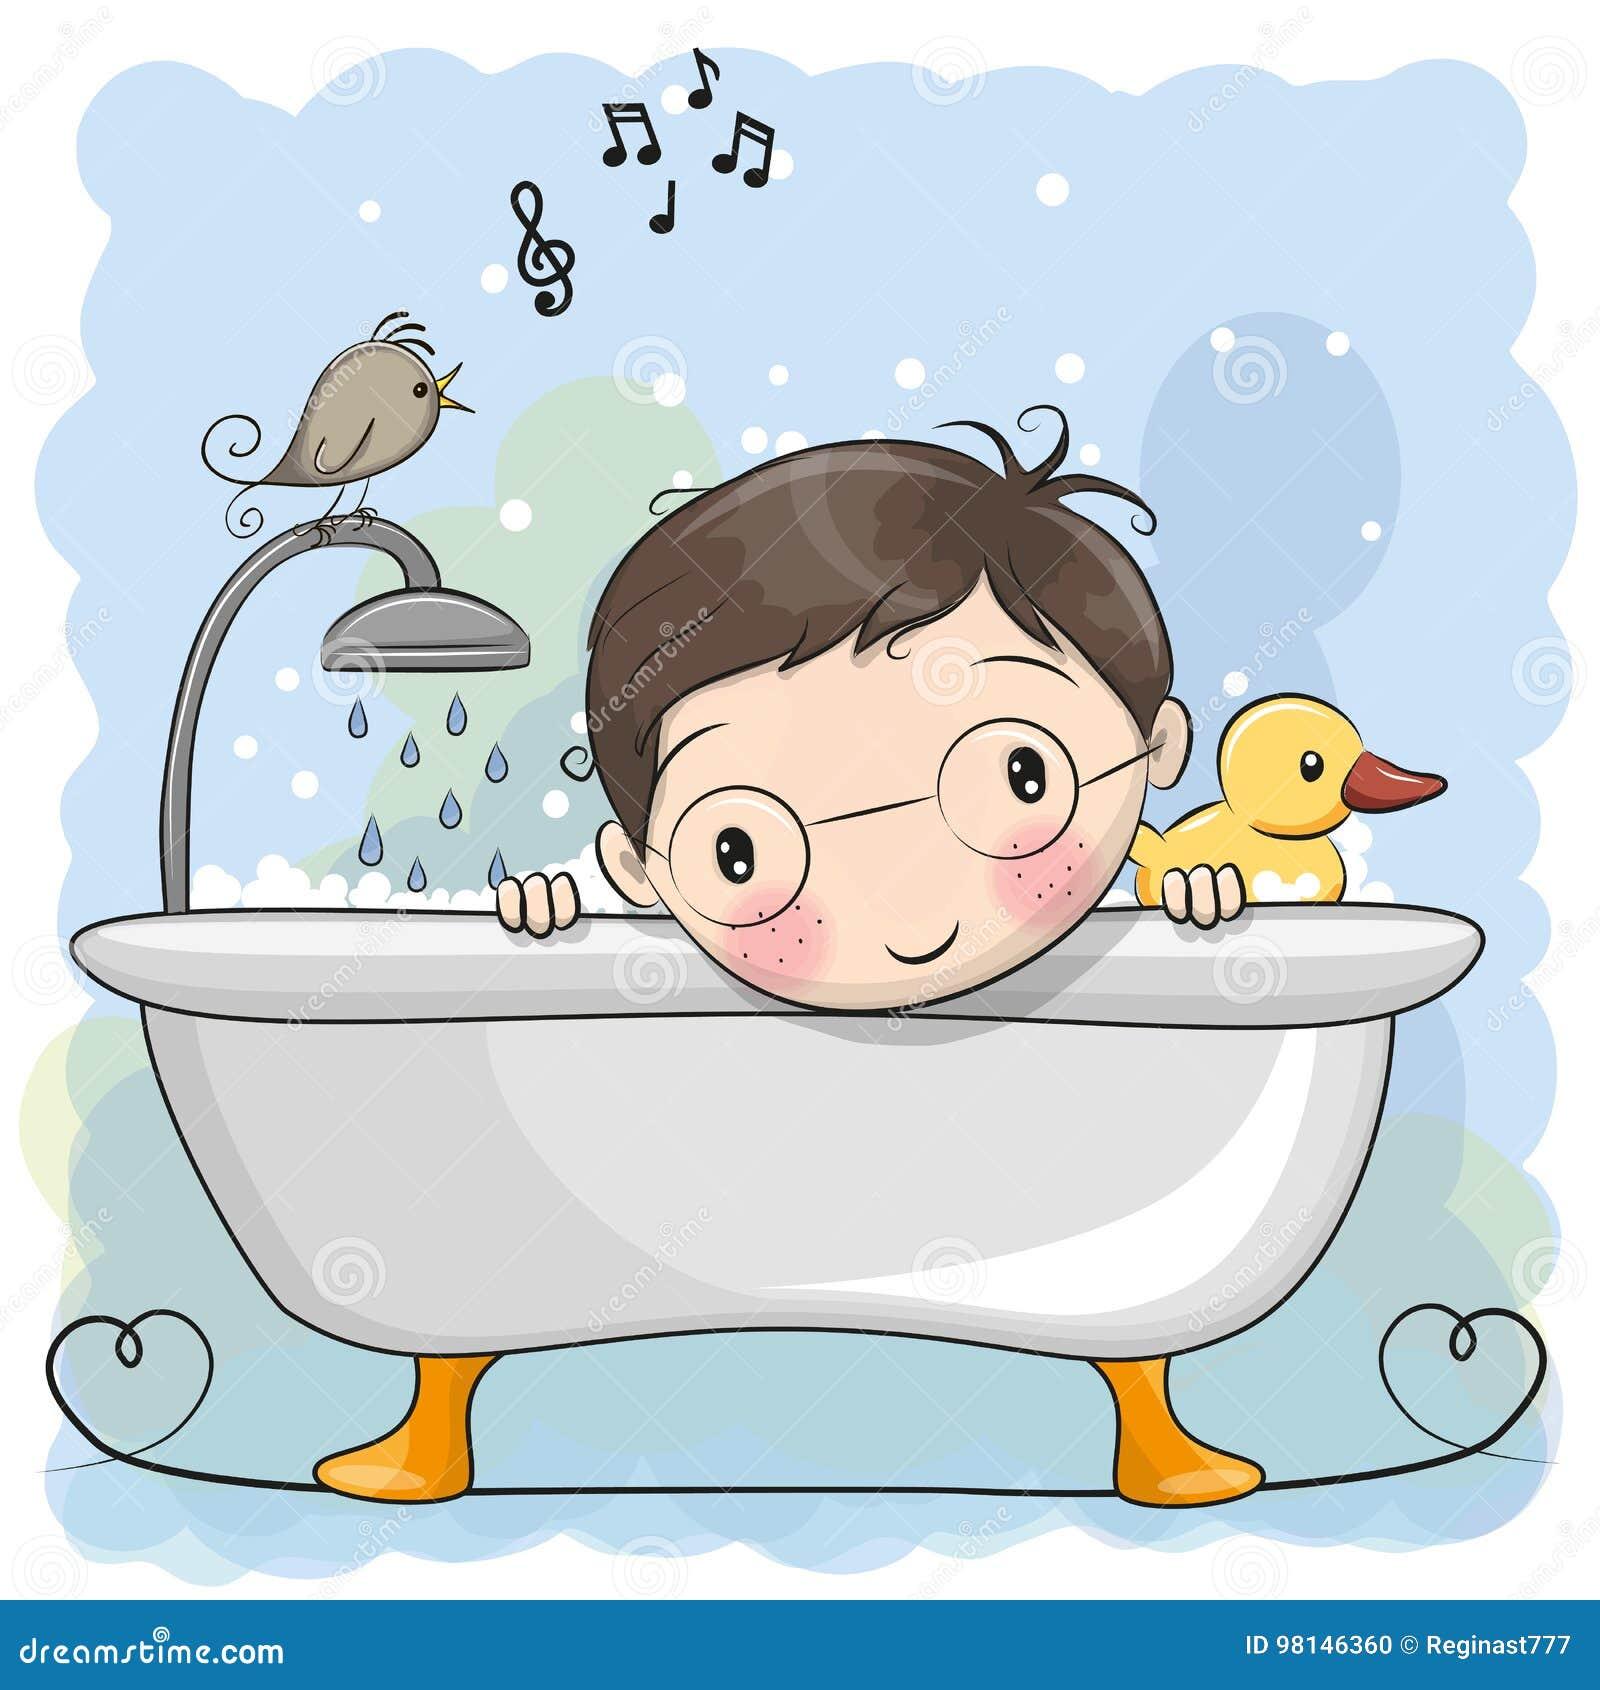 Cute Little Boys Taking Bath In Bathtub Full Of Foam